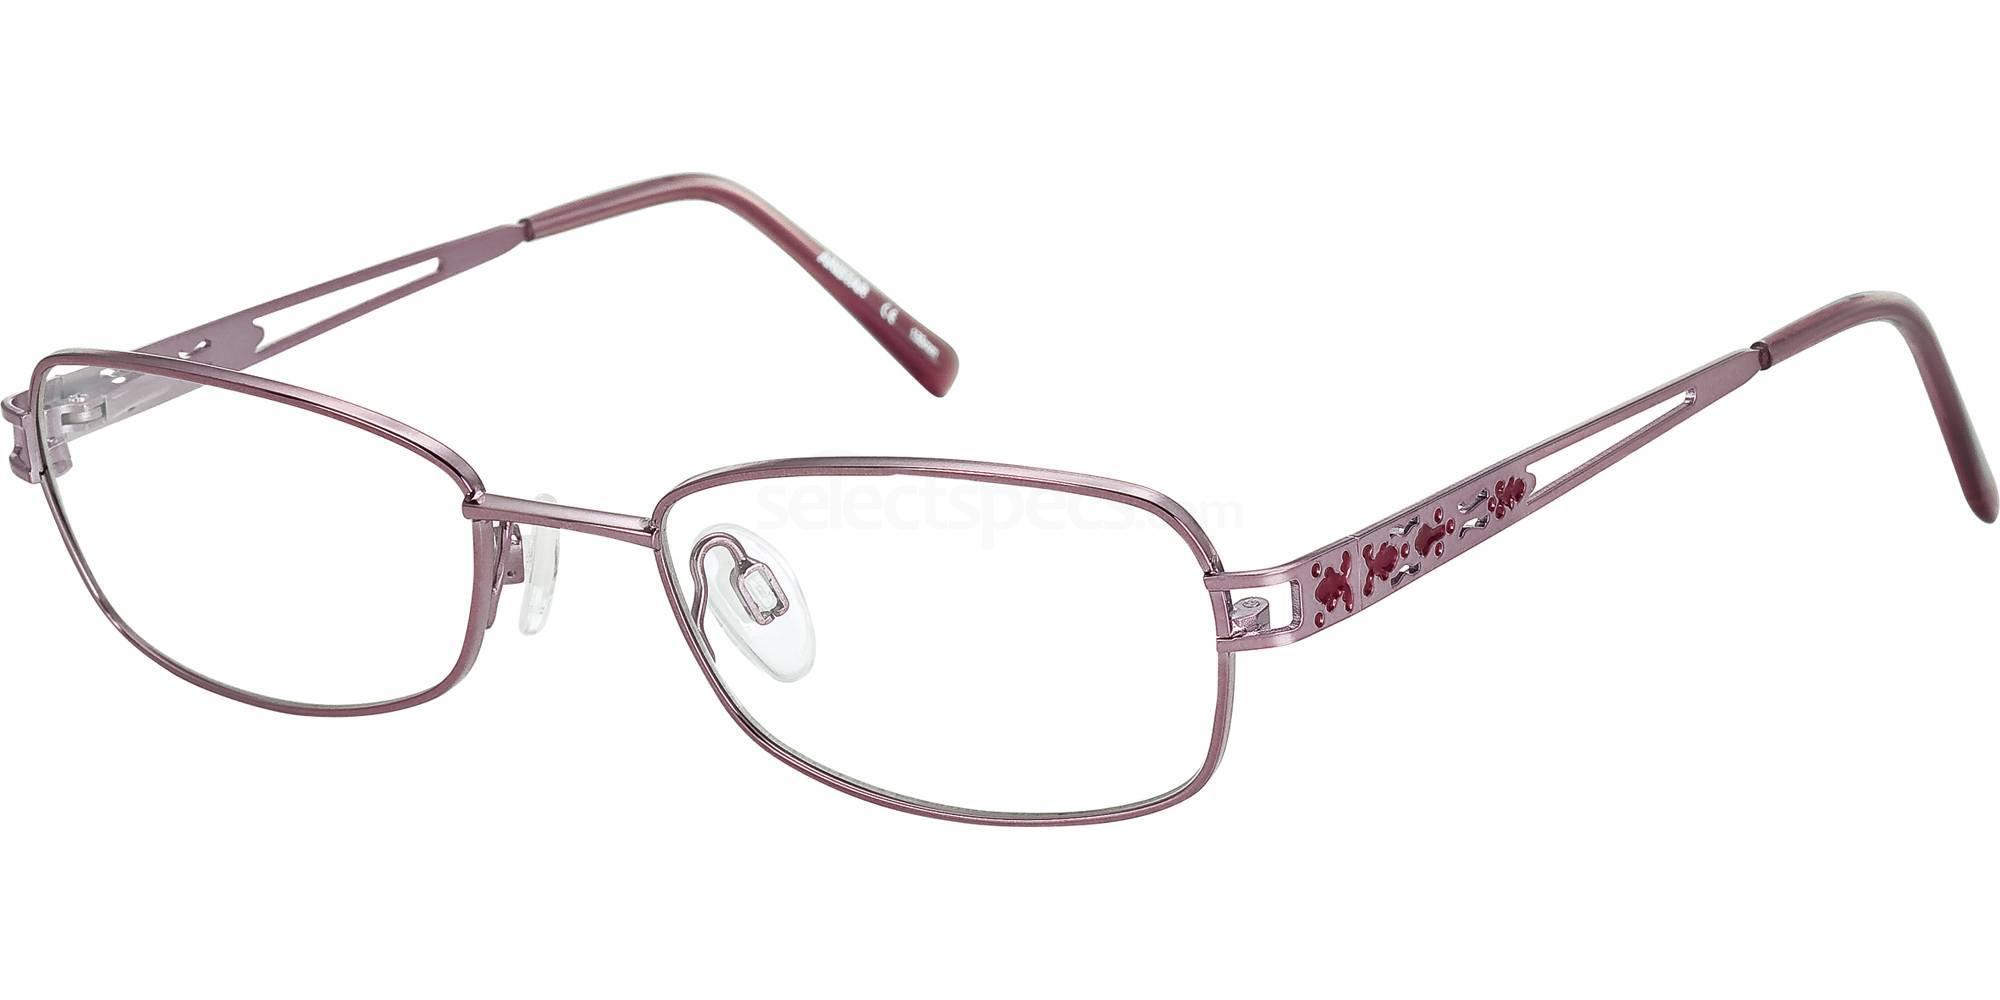 534 AR16355 Glasses, Aristar